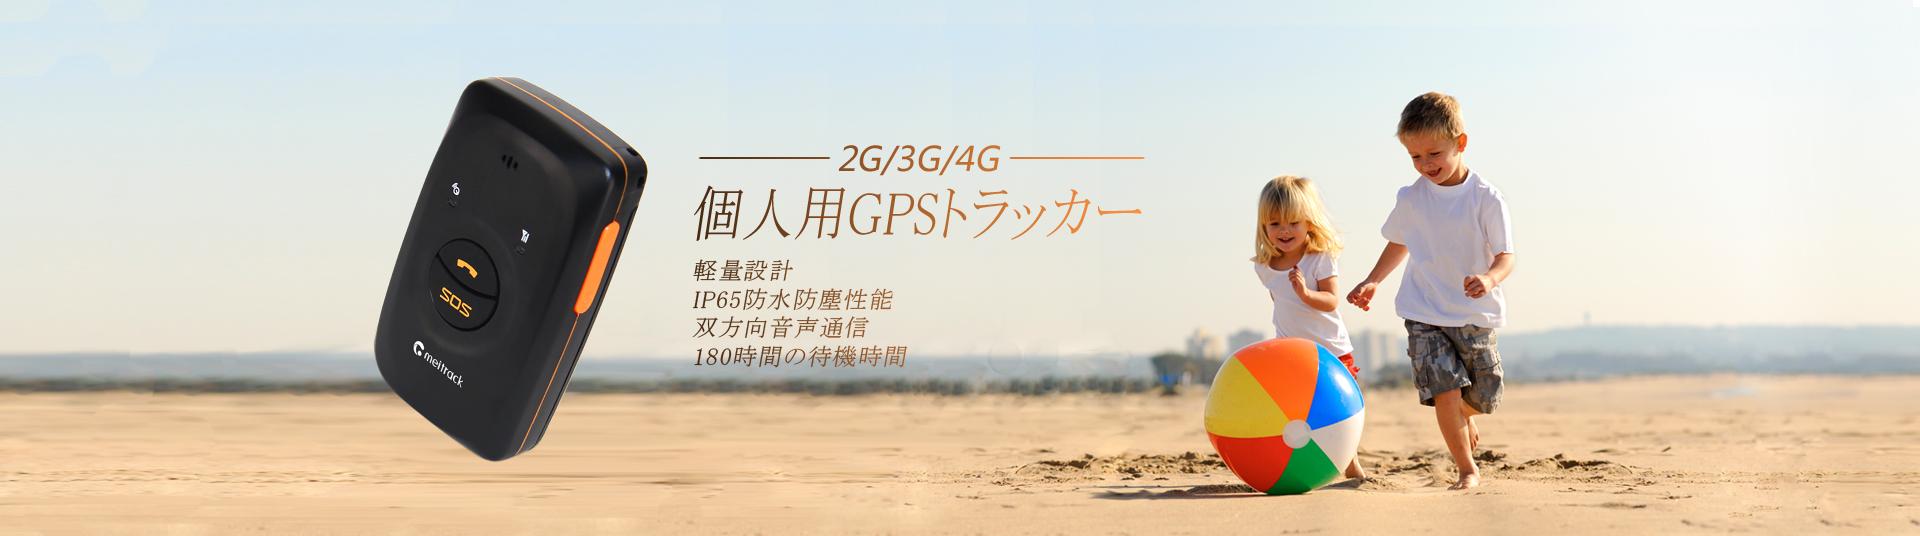 MT90-Series-banner_jp